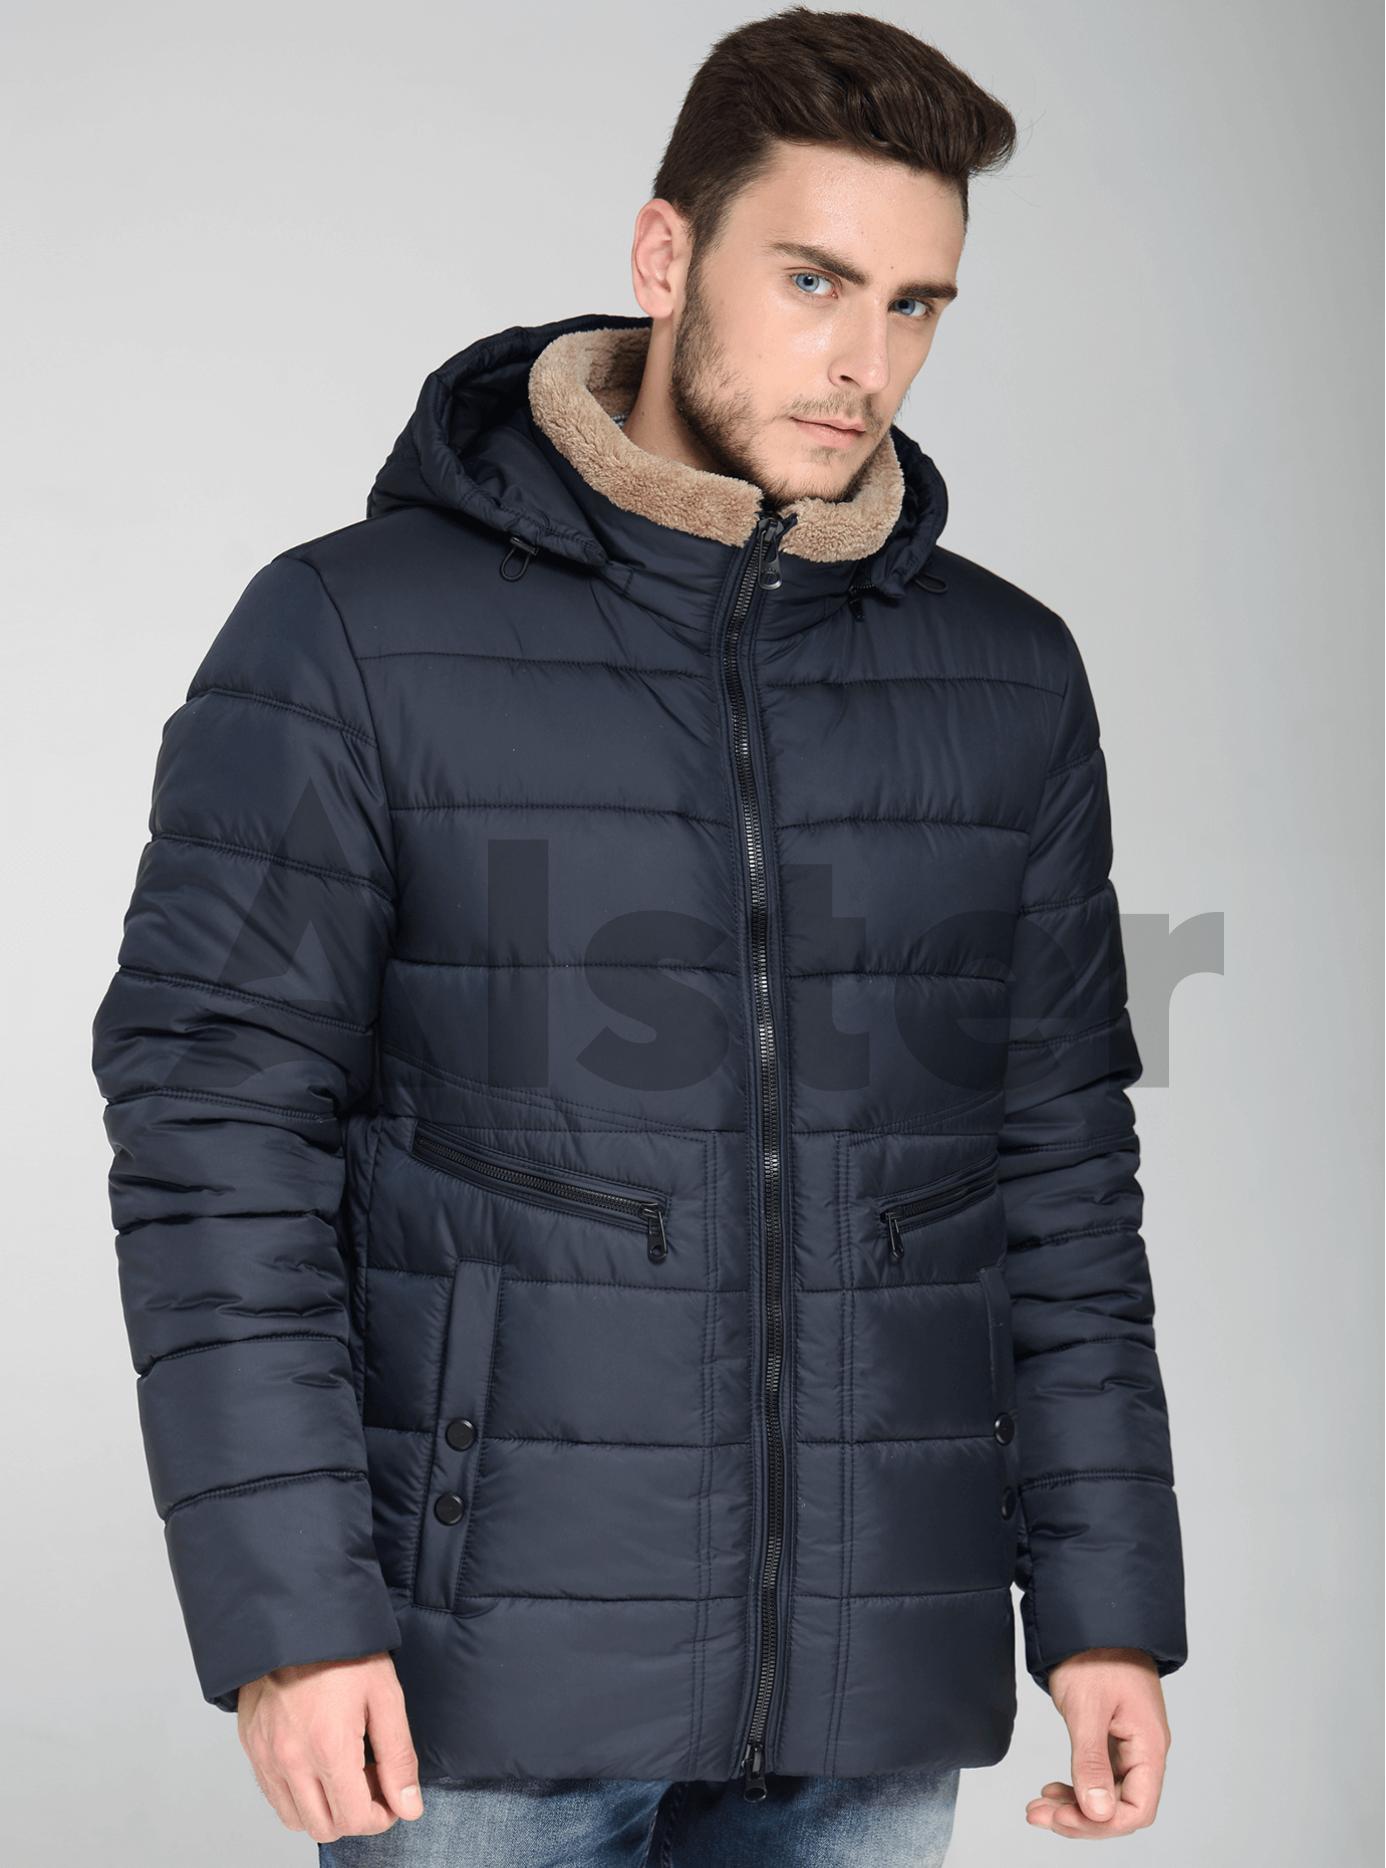 Зимняя мужская куртка с карманами Хаки 48 (02-MT19274): фото - Alster.ua